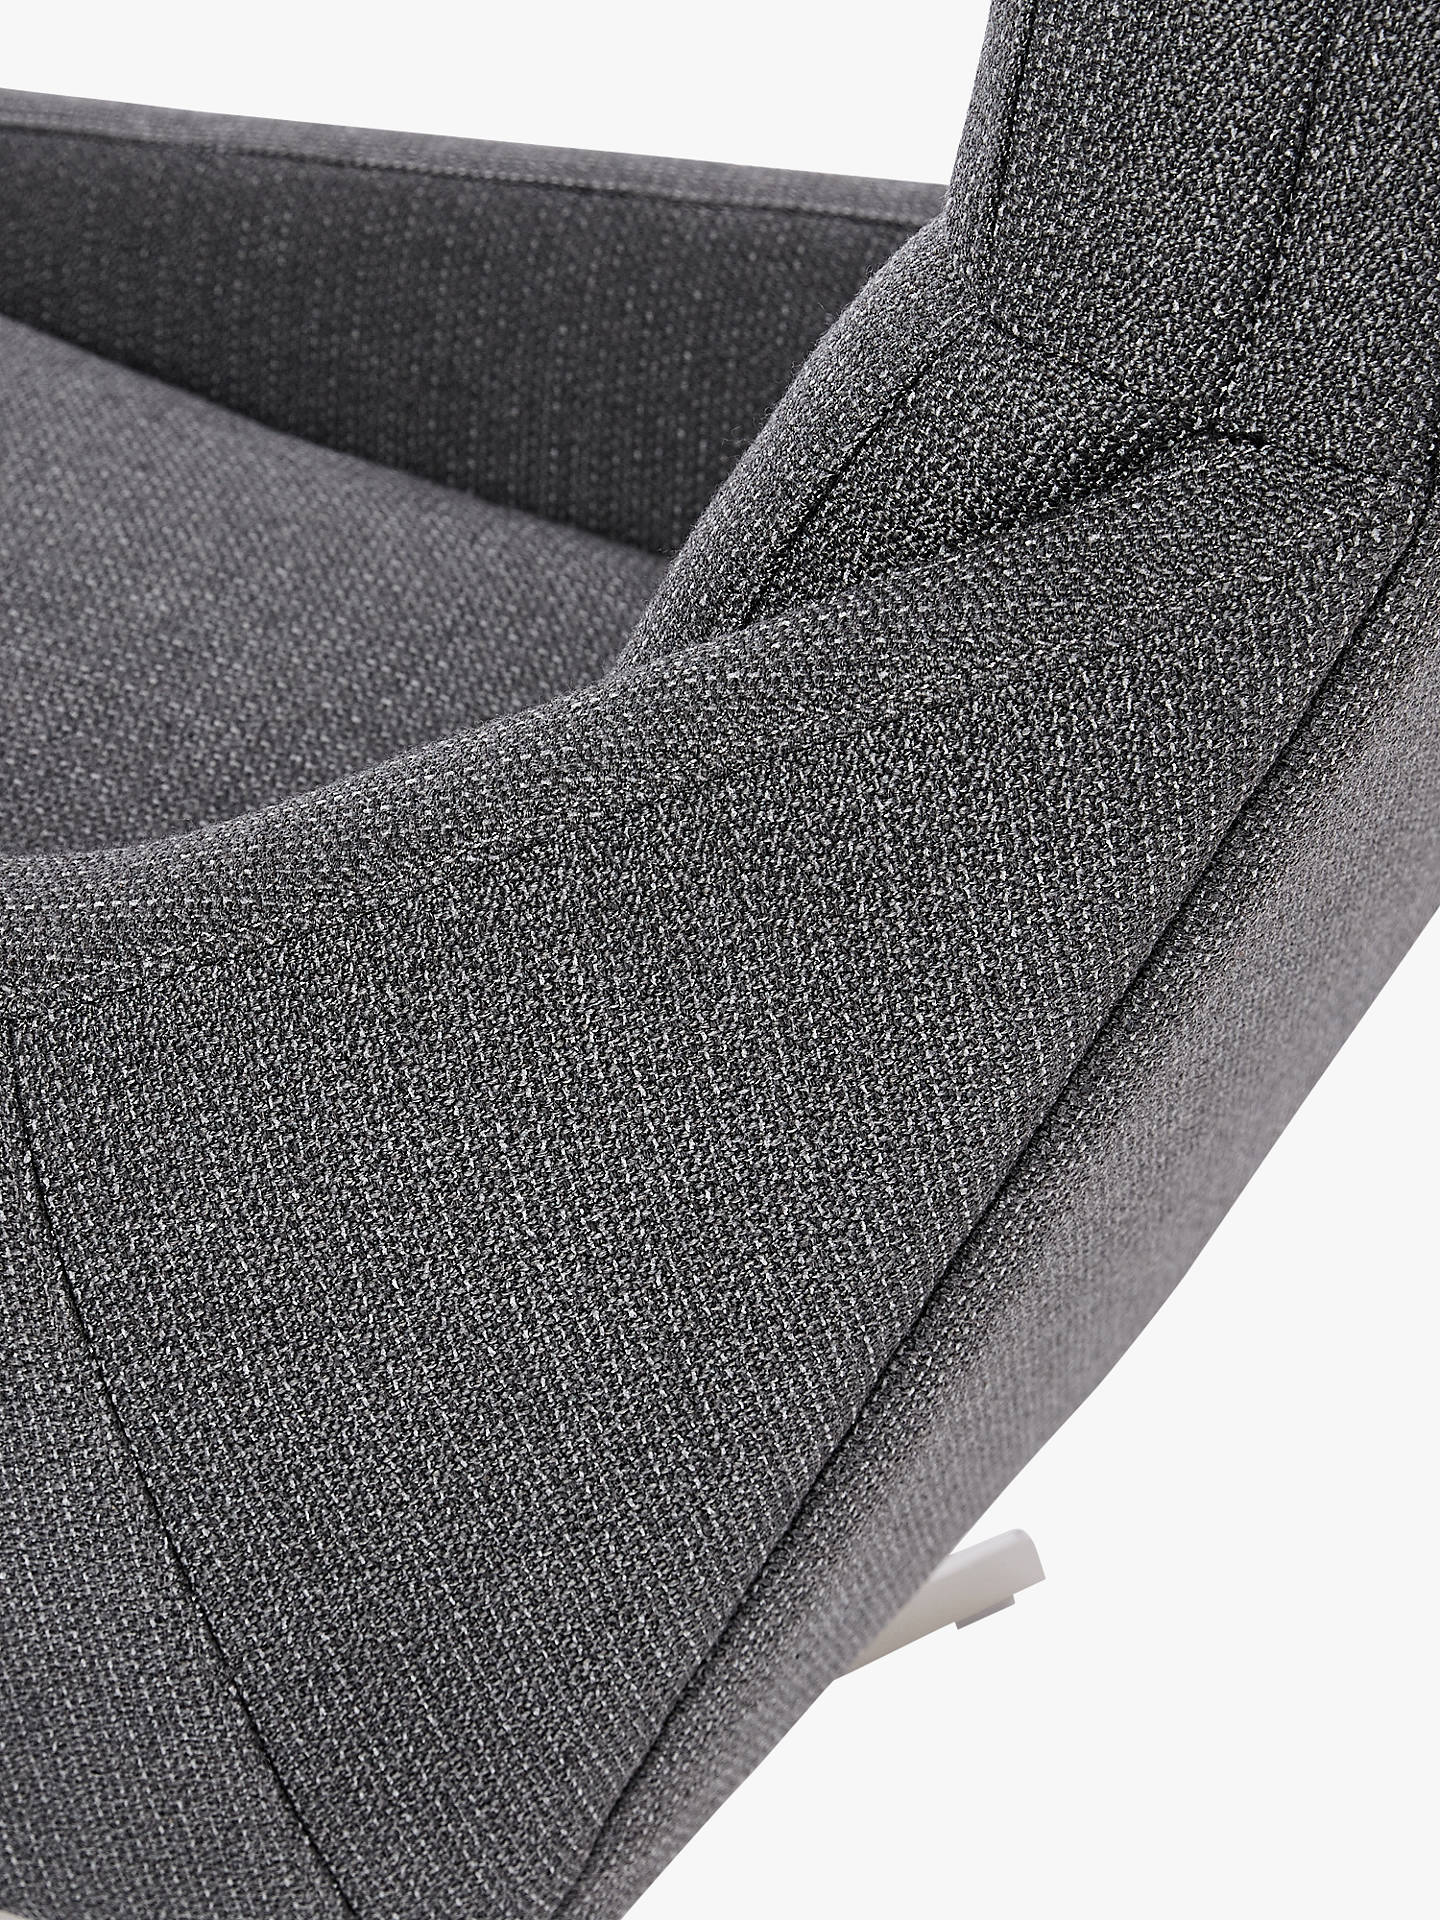 Swell West Elm Austin Swivel Chair Mod Weave Grey At John Lewis Theyellowbook Wood Chair Design Ideas Theyellowbookinfo